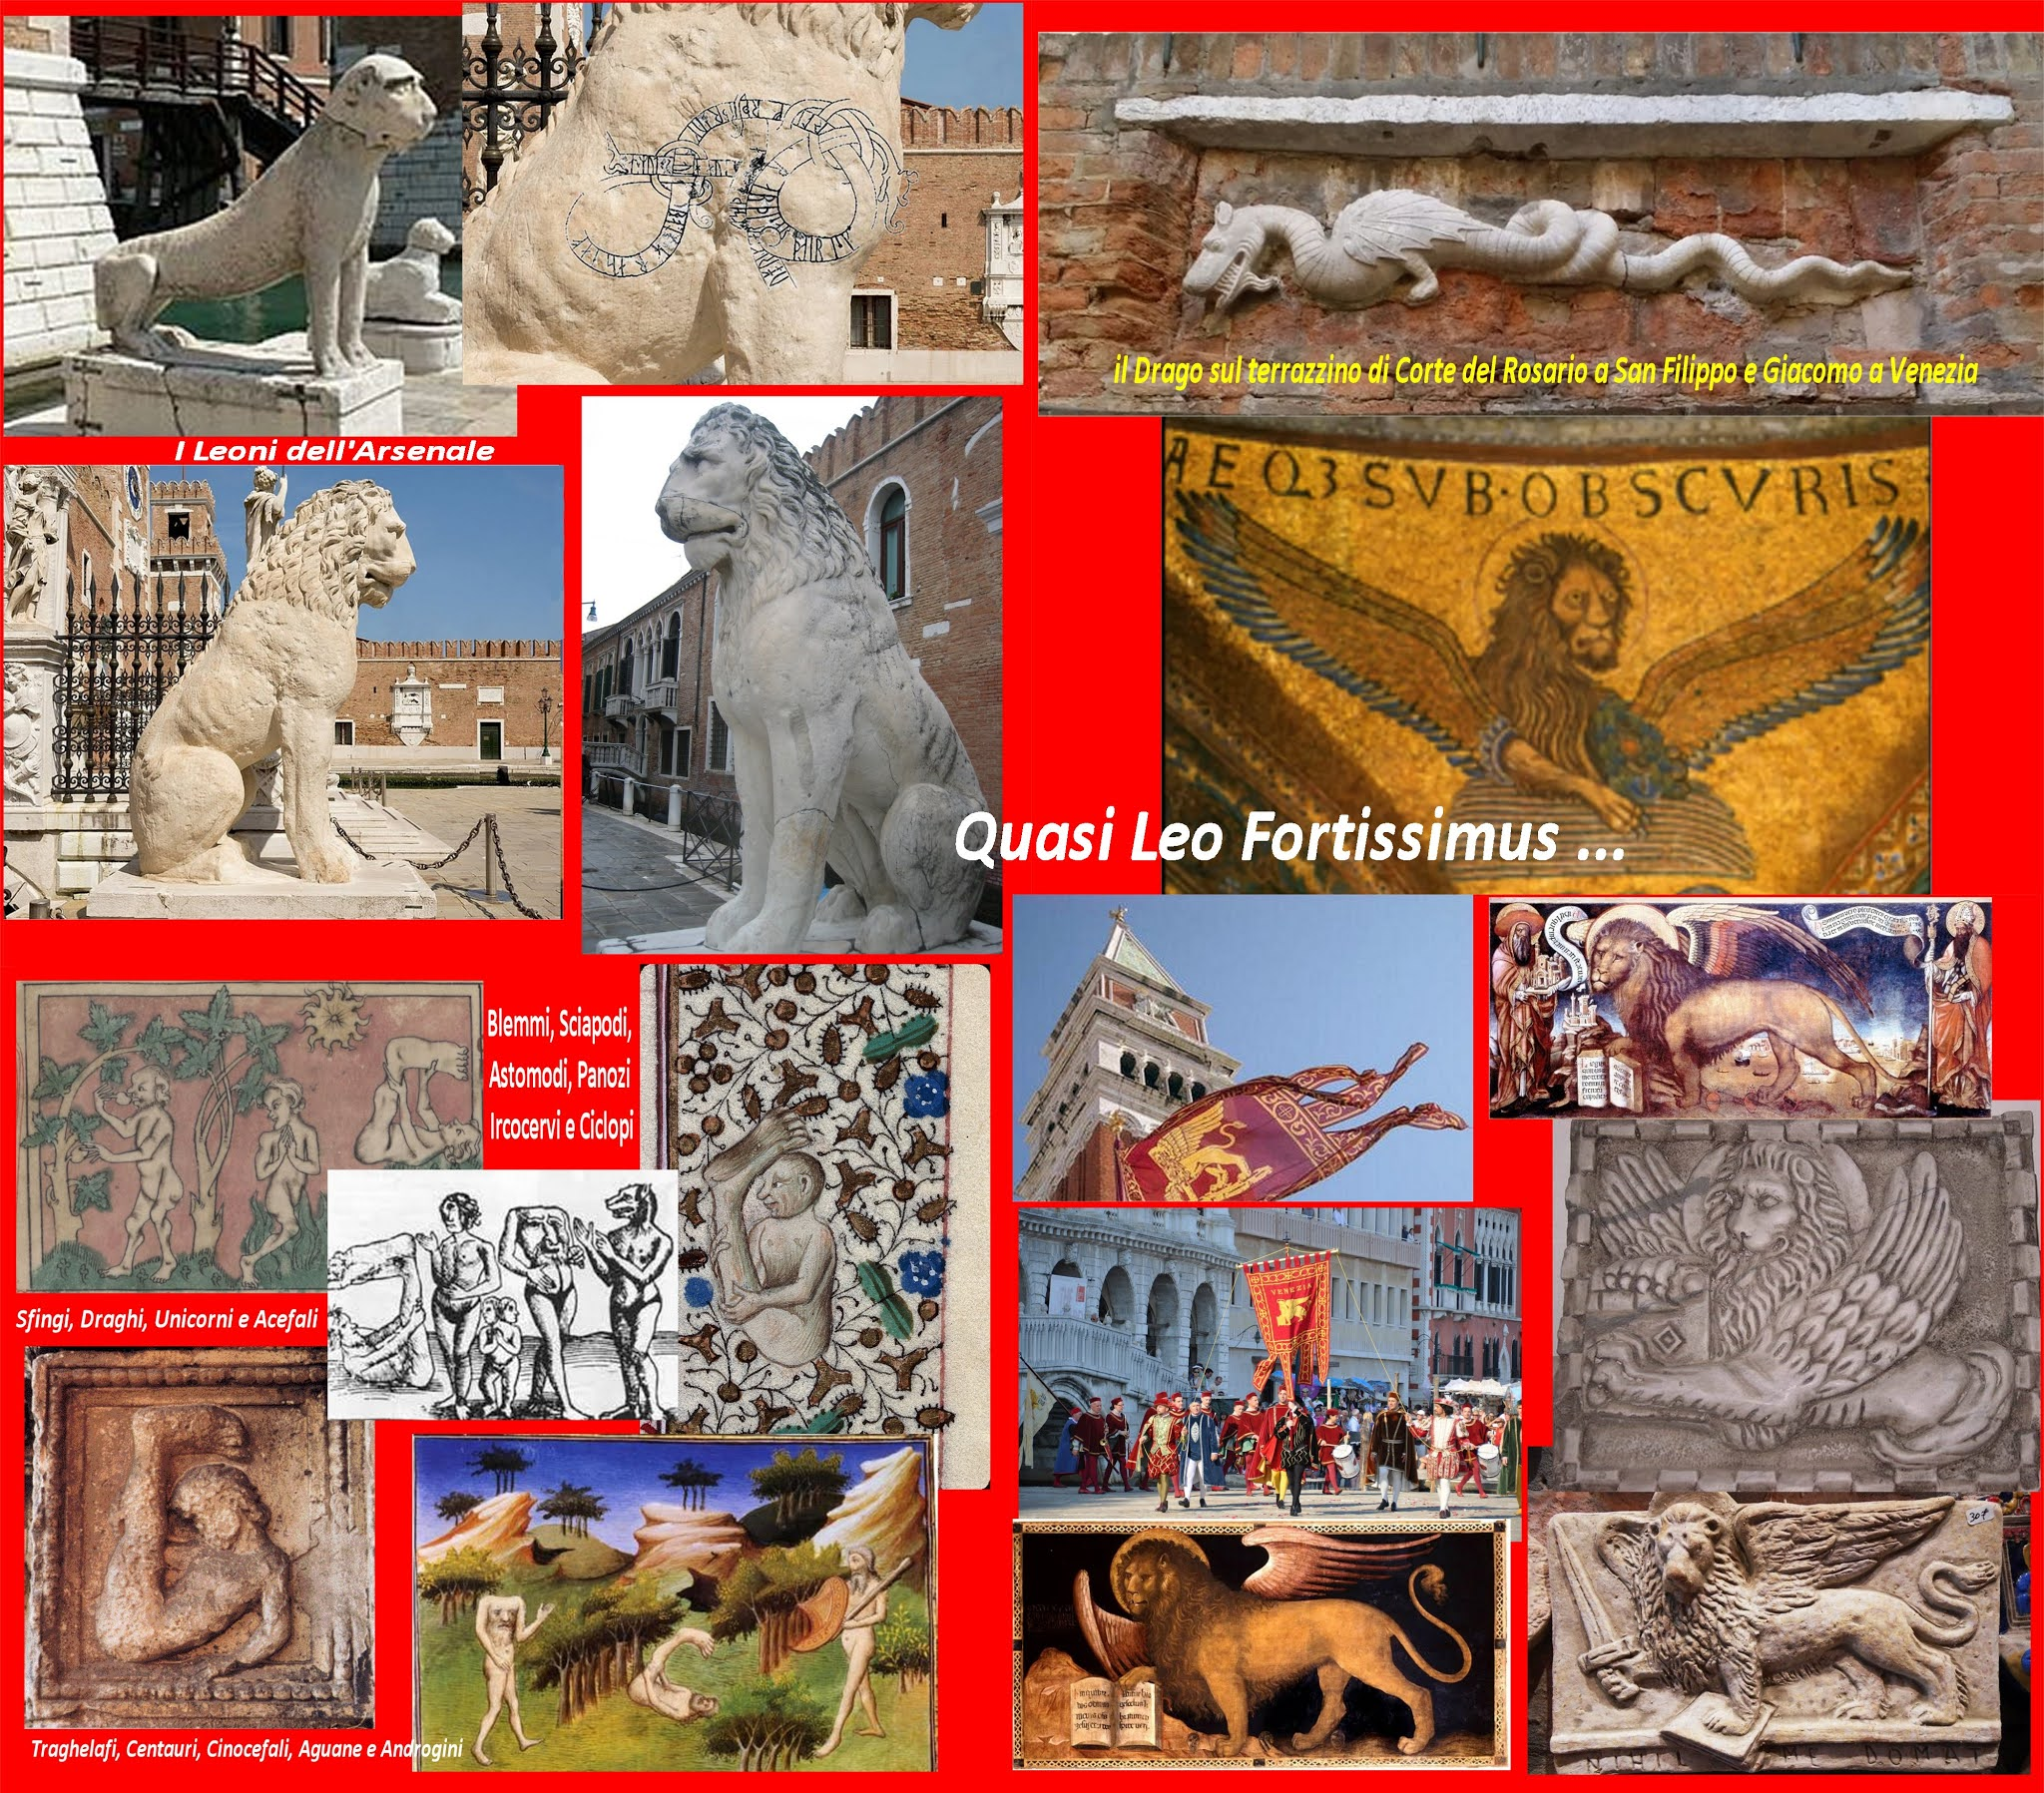 Unacuriositavenezianapervolta Venezia Fra Leoni Draghi E Serpenti